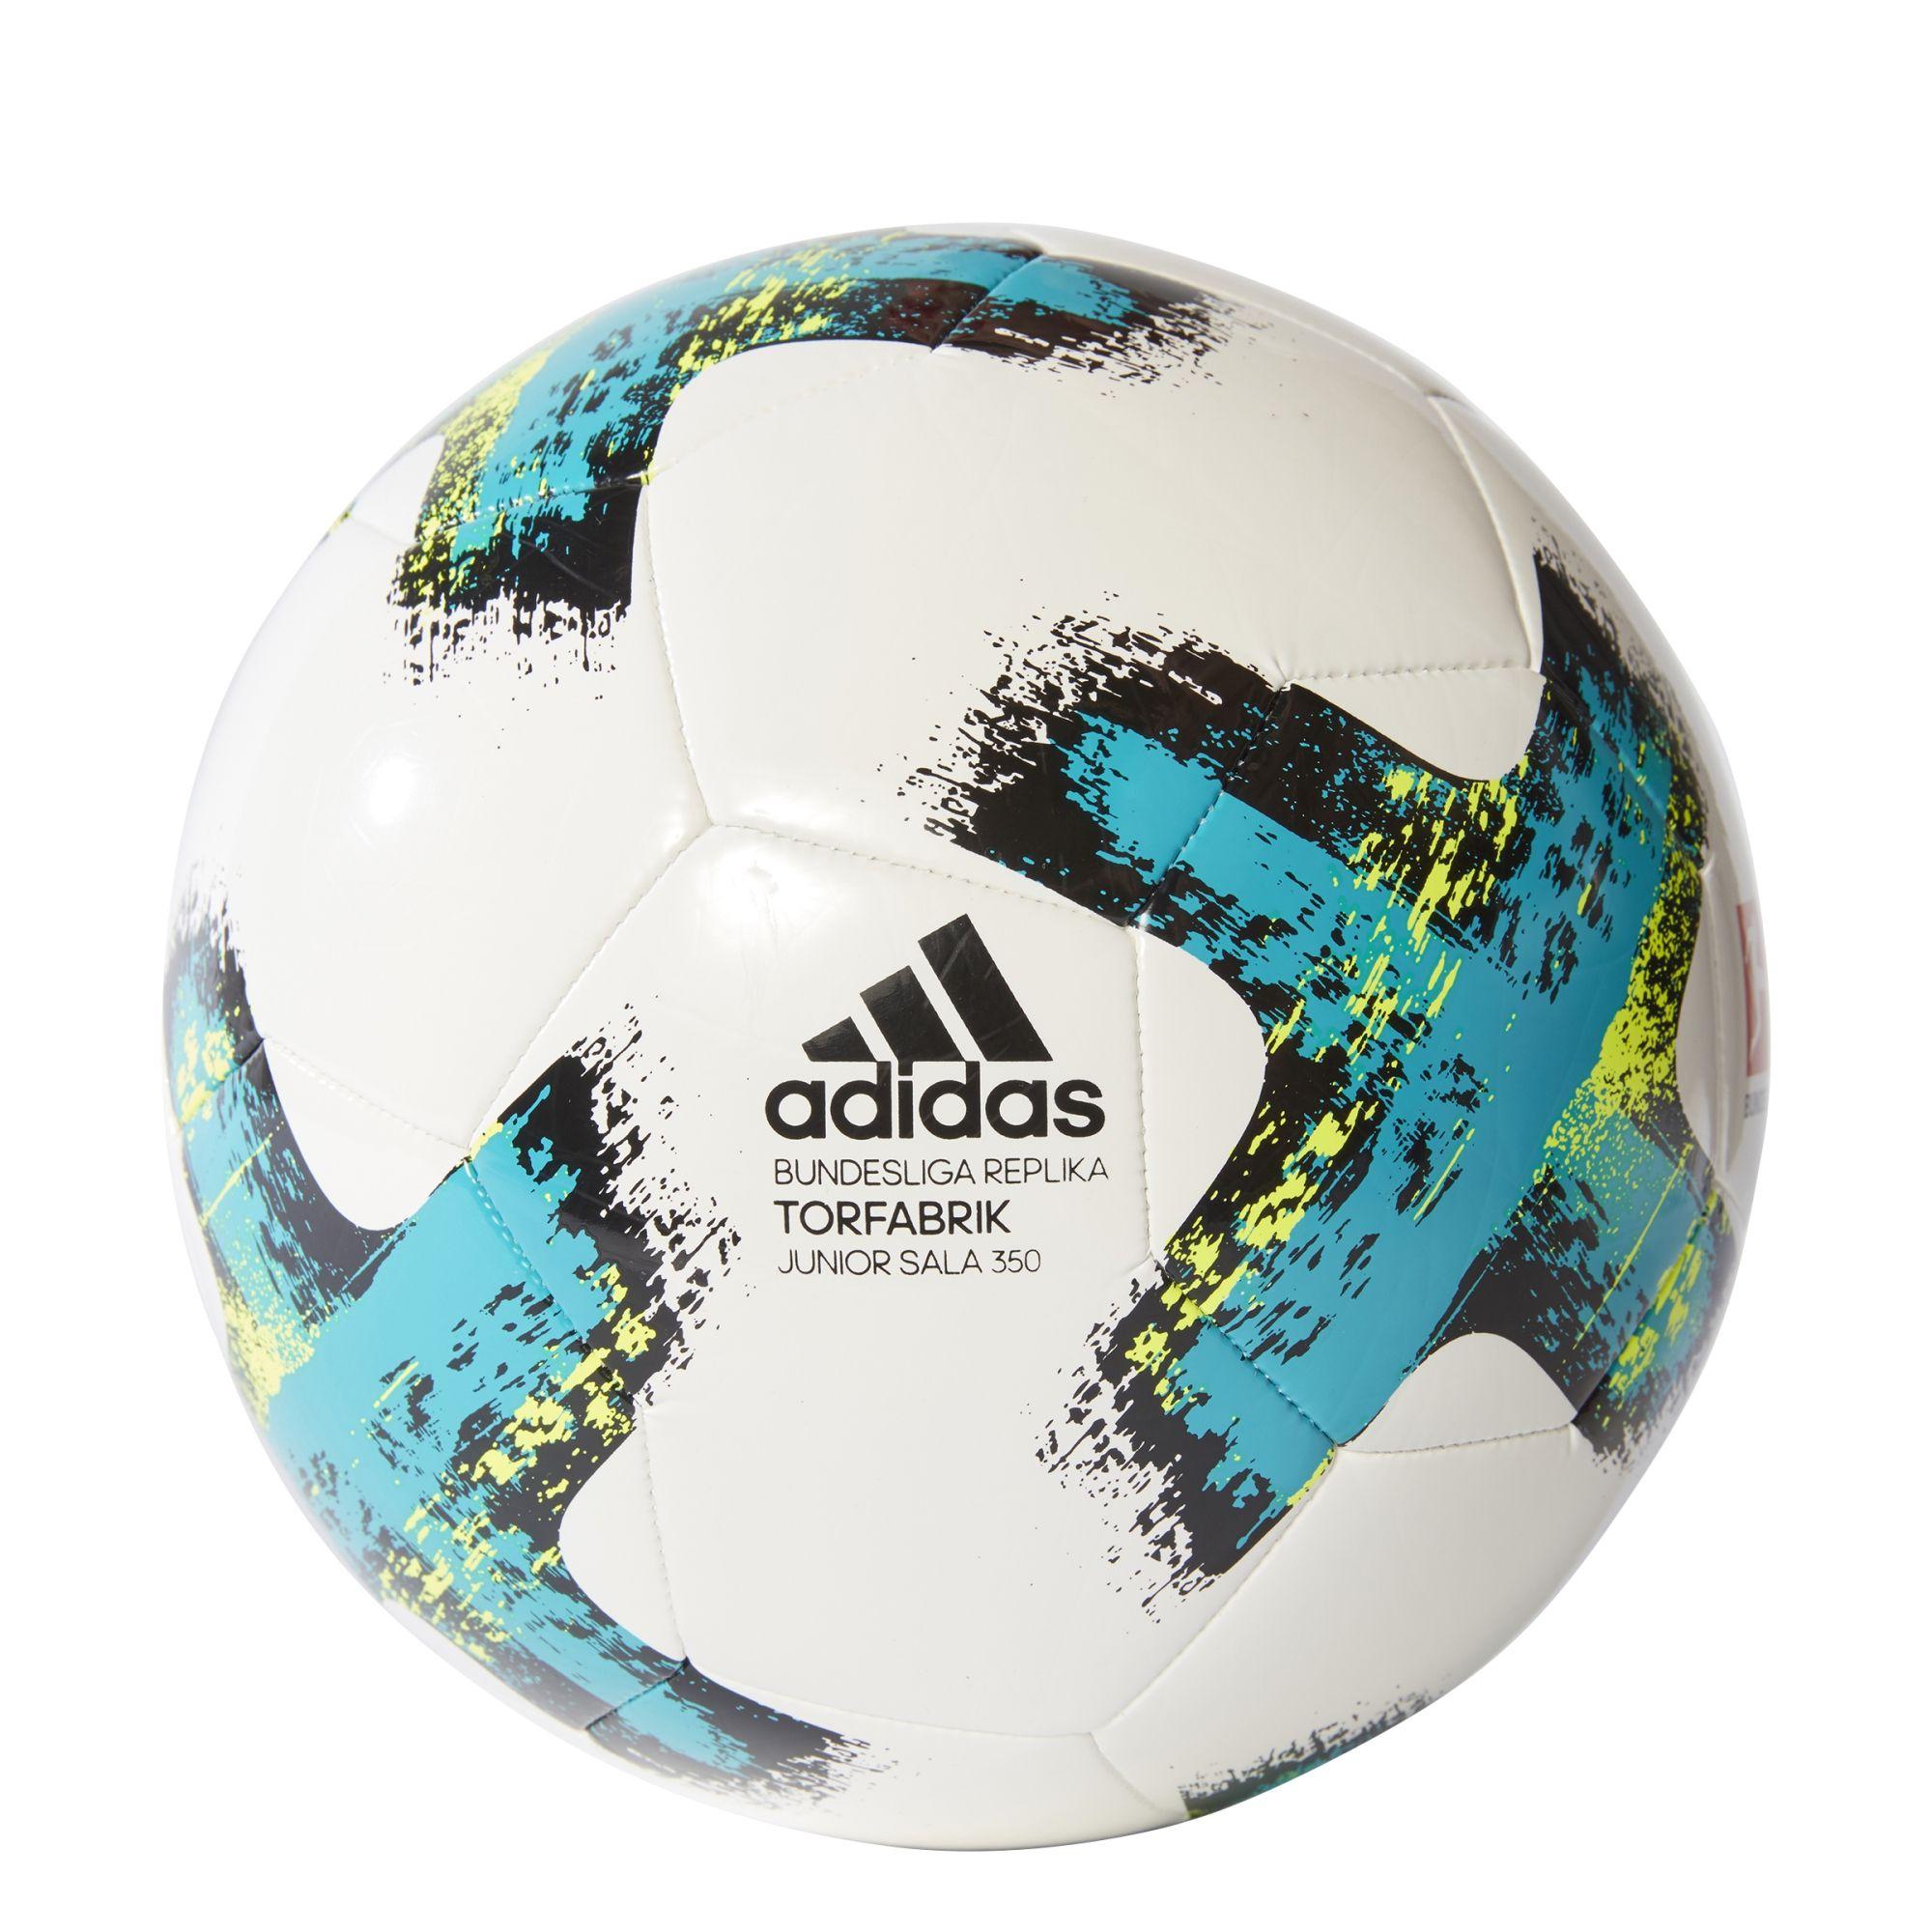 ADIDAS PERFORMANCE adidas Performance Fußball »Torfabrik Junior Sala 350 17/18«